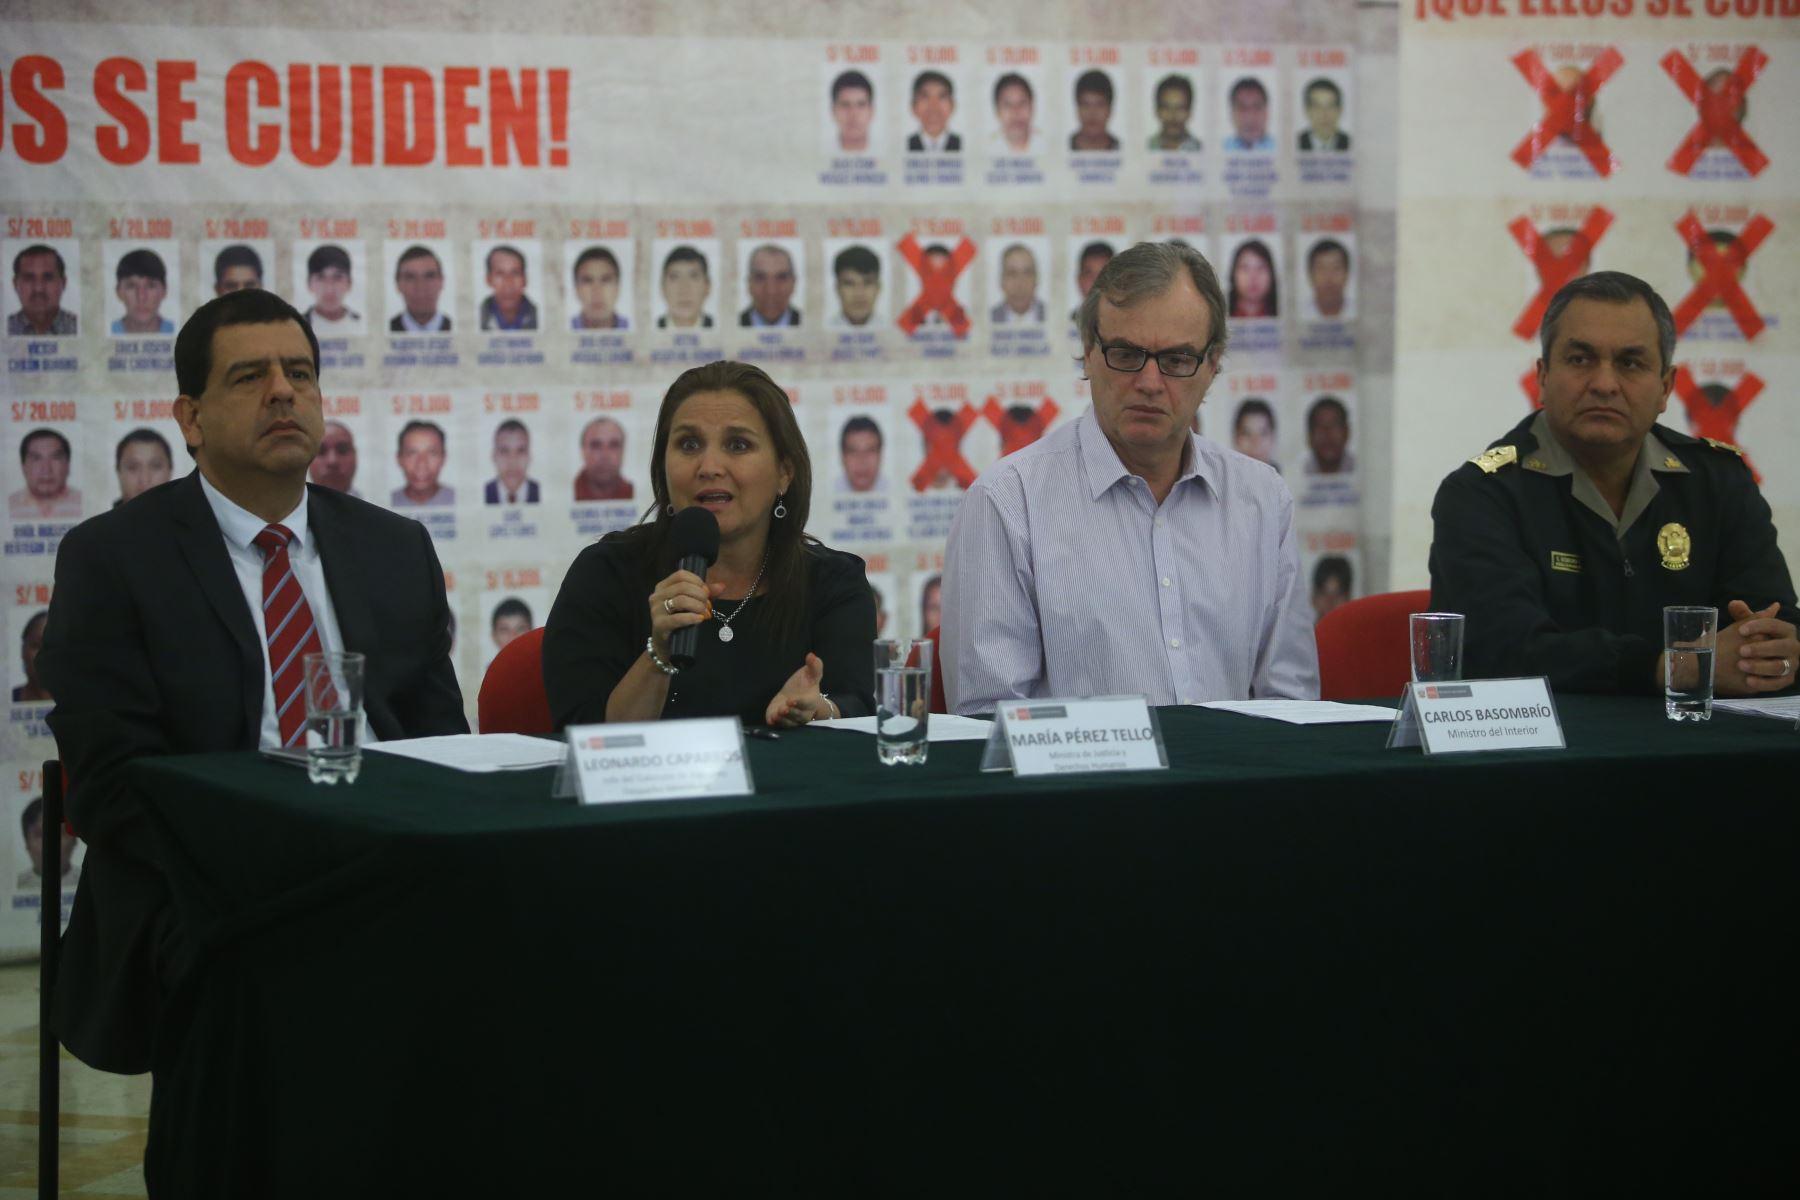 Lima per octubre 28 el ministro del interior carlos for Nombre del ministro de interior y justicia 2016